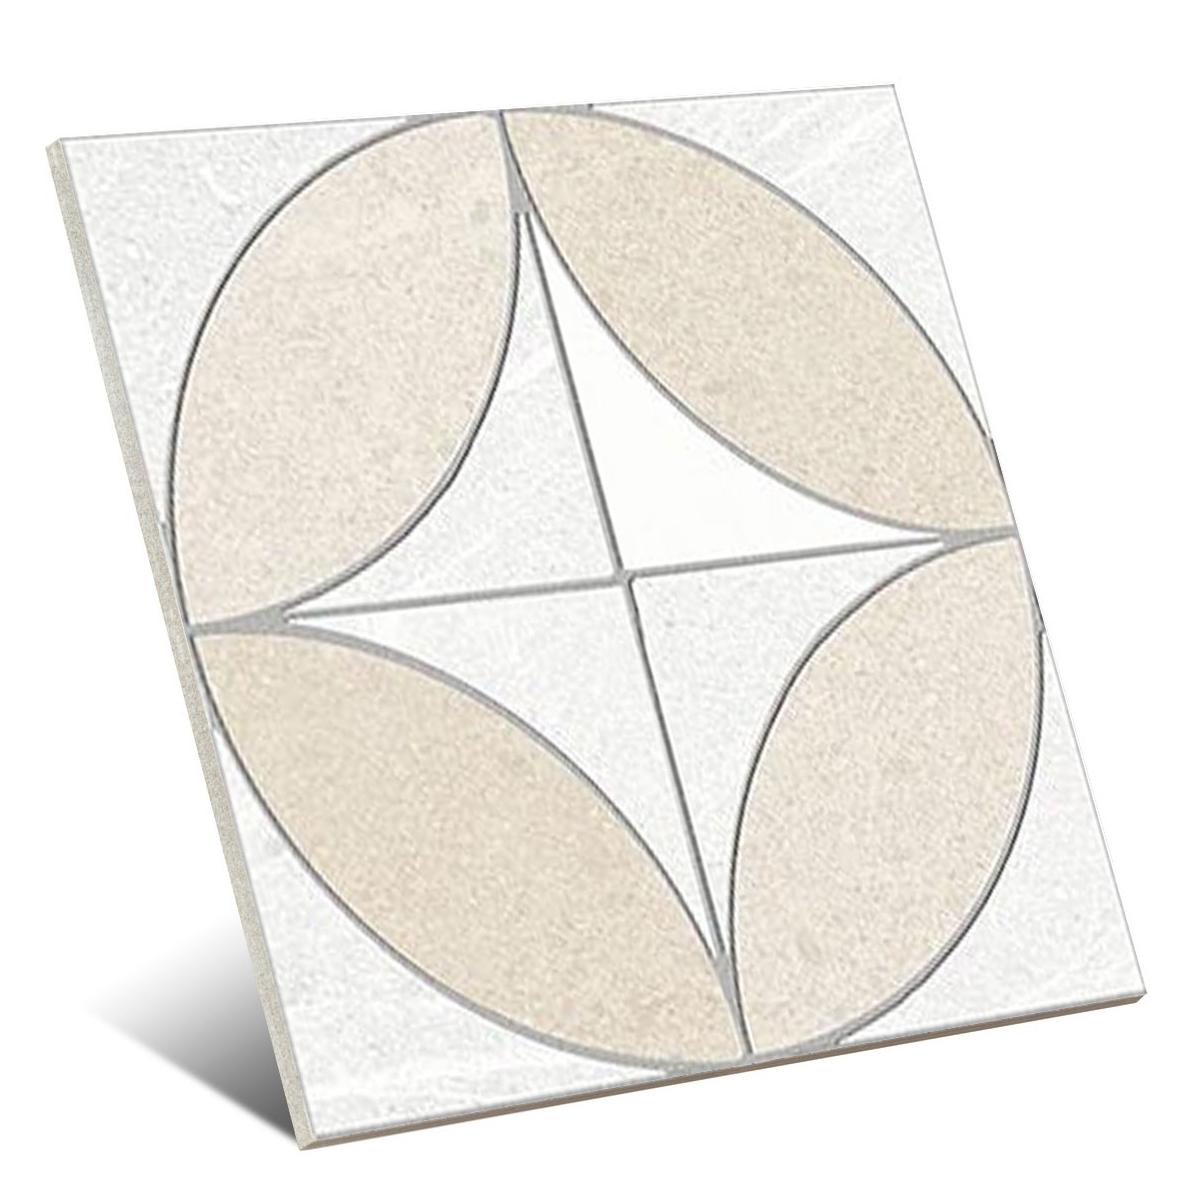 Bezons Crema 15x15 (m2) - Serie Seine - Marca Vives